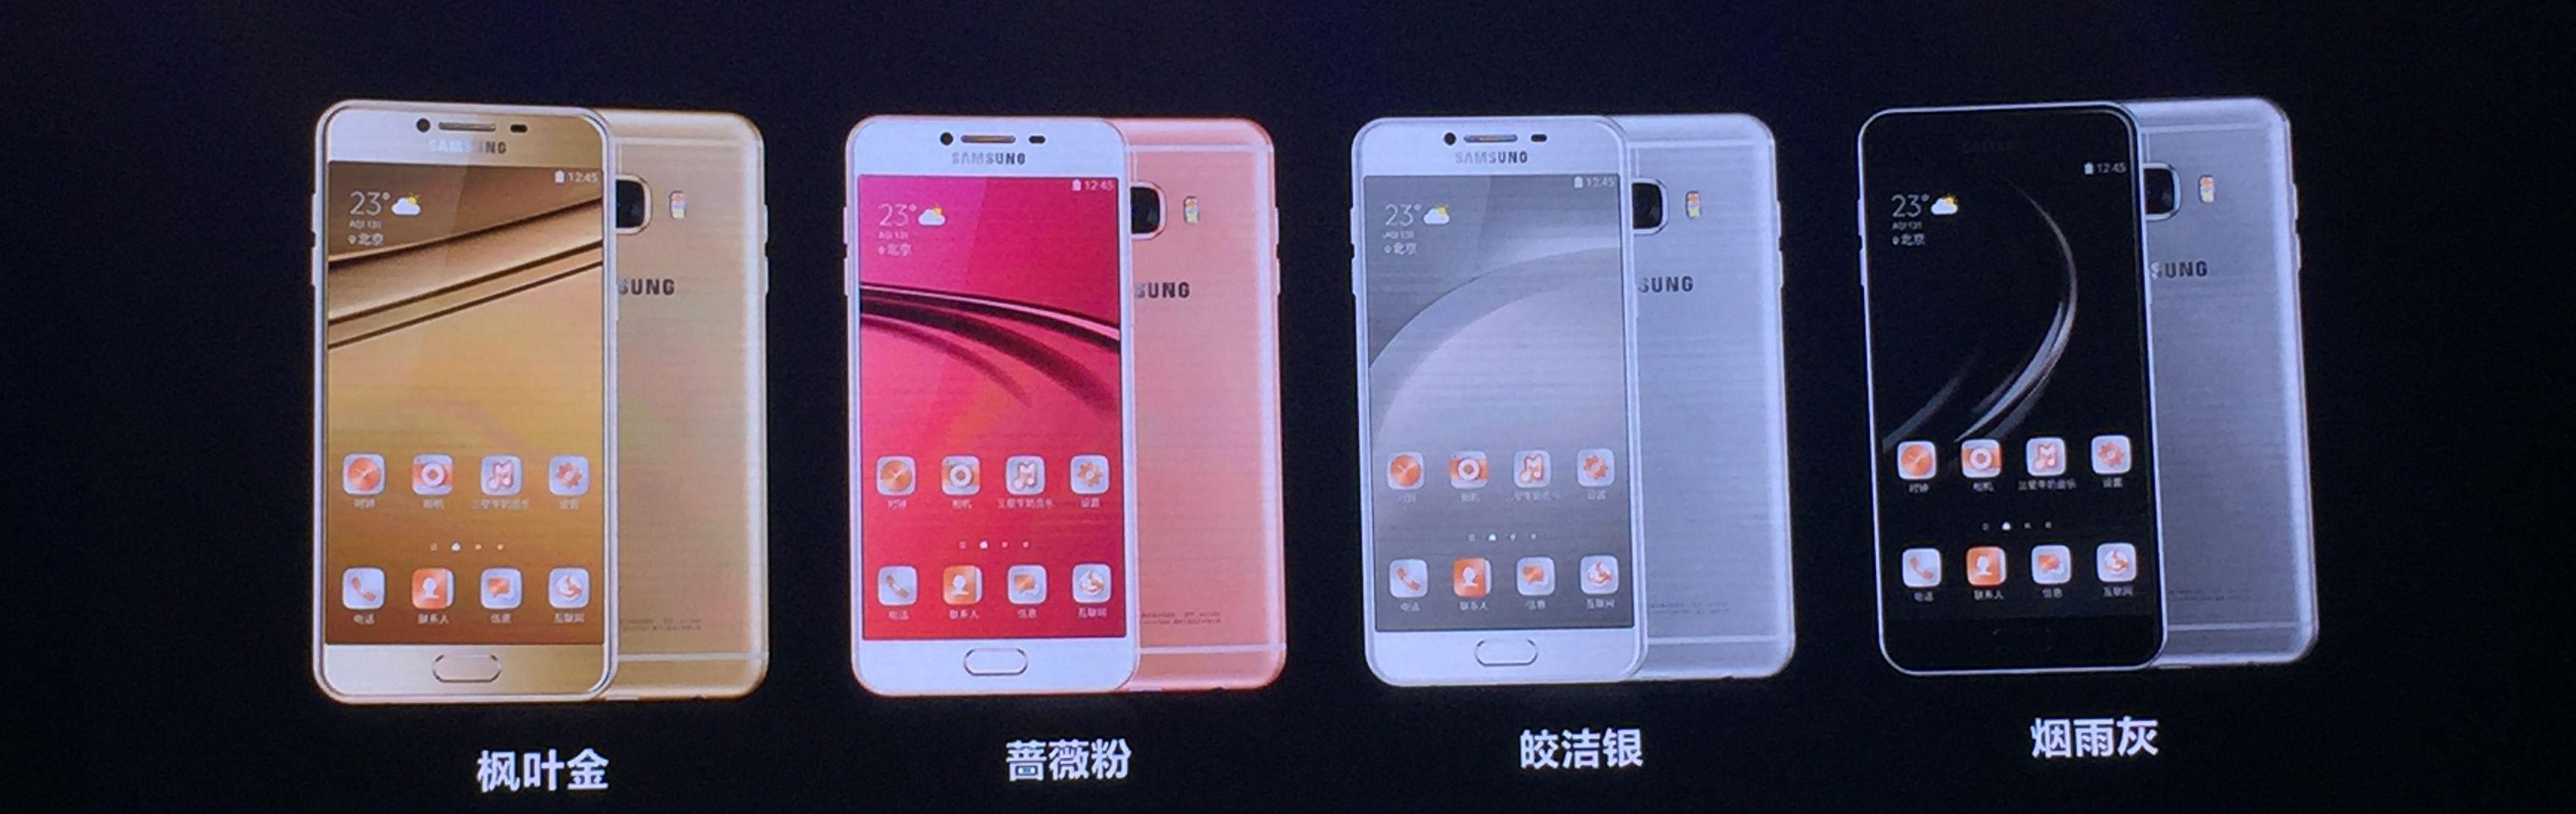 Стала известна цена Samsung Galaxy C5 и Galaxy C7